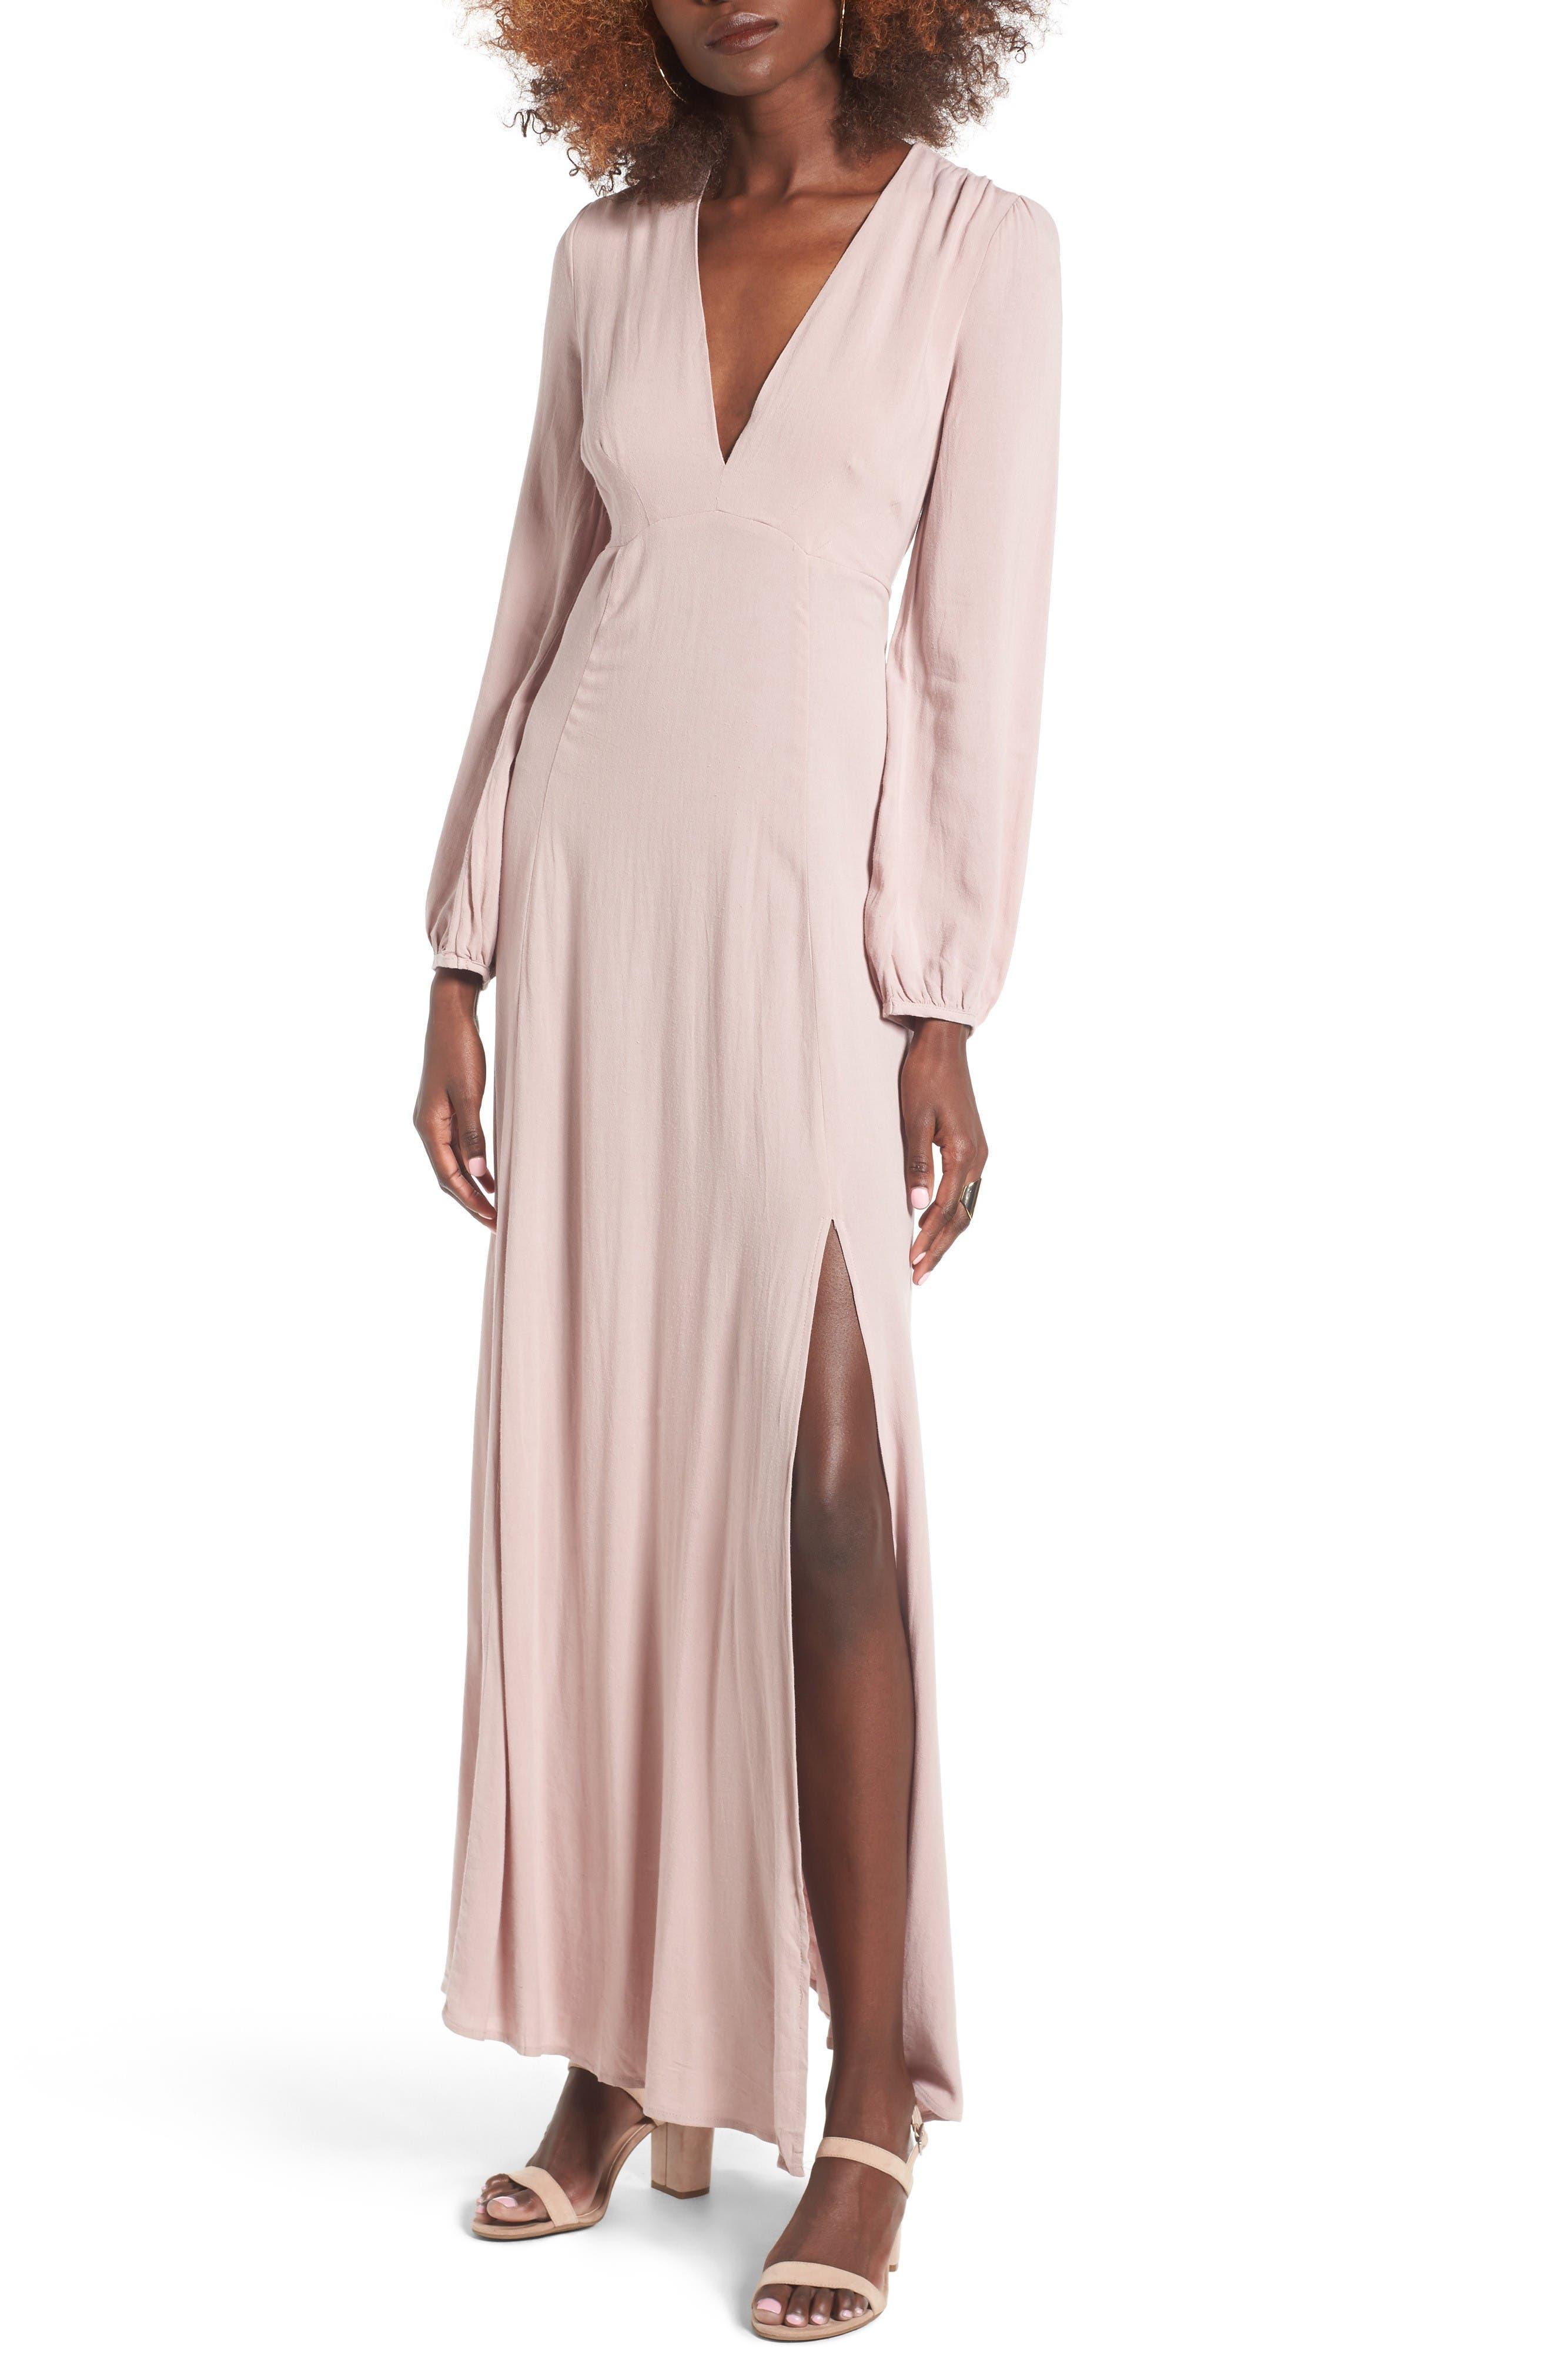 Main Image - Lush Open Back Woven Maxi Dress